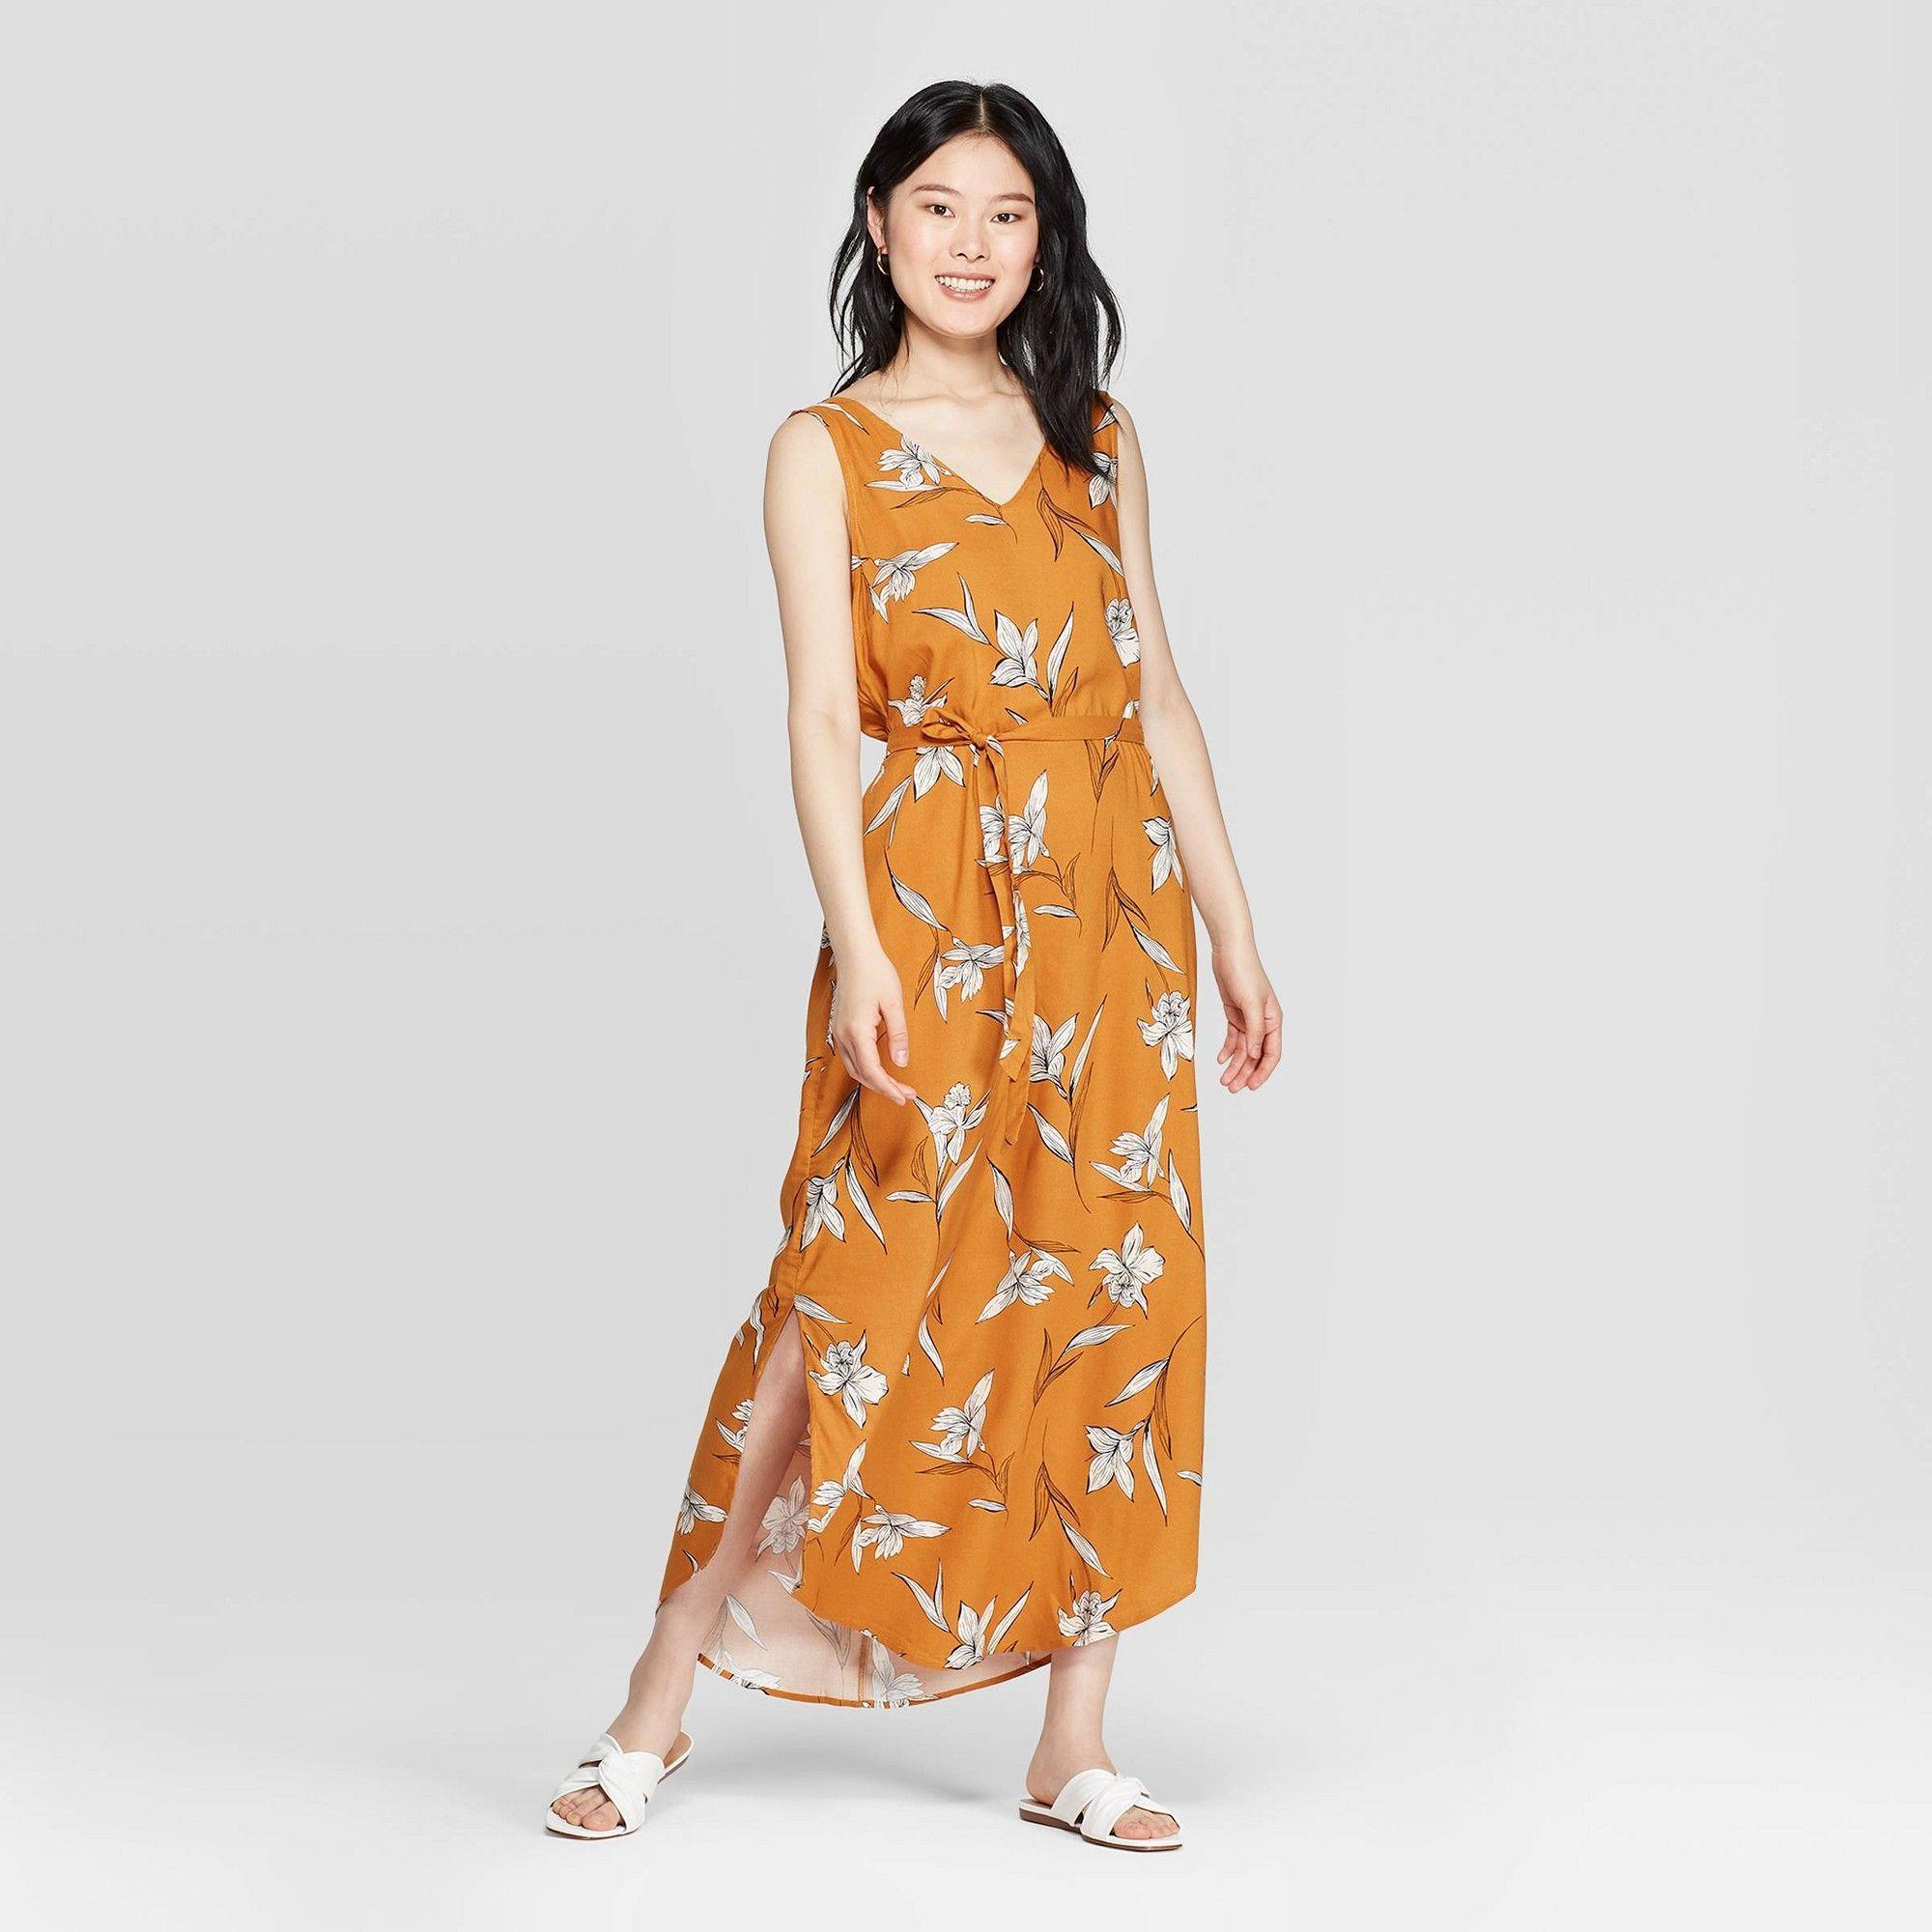 Women S Floral Print Sleeveless V Neck Maxi Dress A New Day Rust L Red Maxi Dress V Neck Midi Dress Womens Maxi Dresses [ 2000 x 2000 Pixel ]